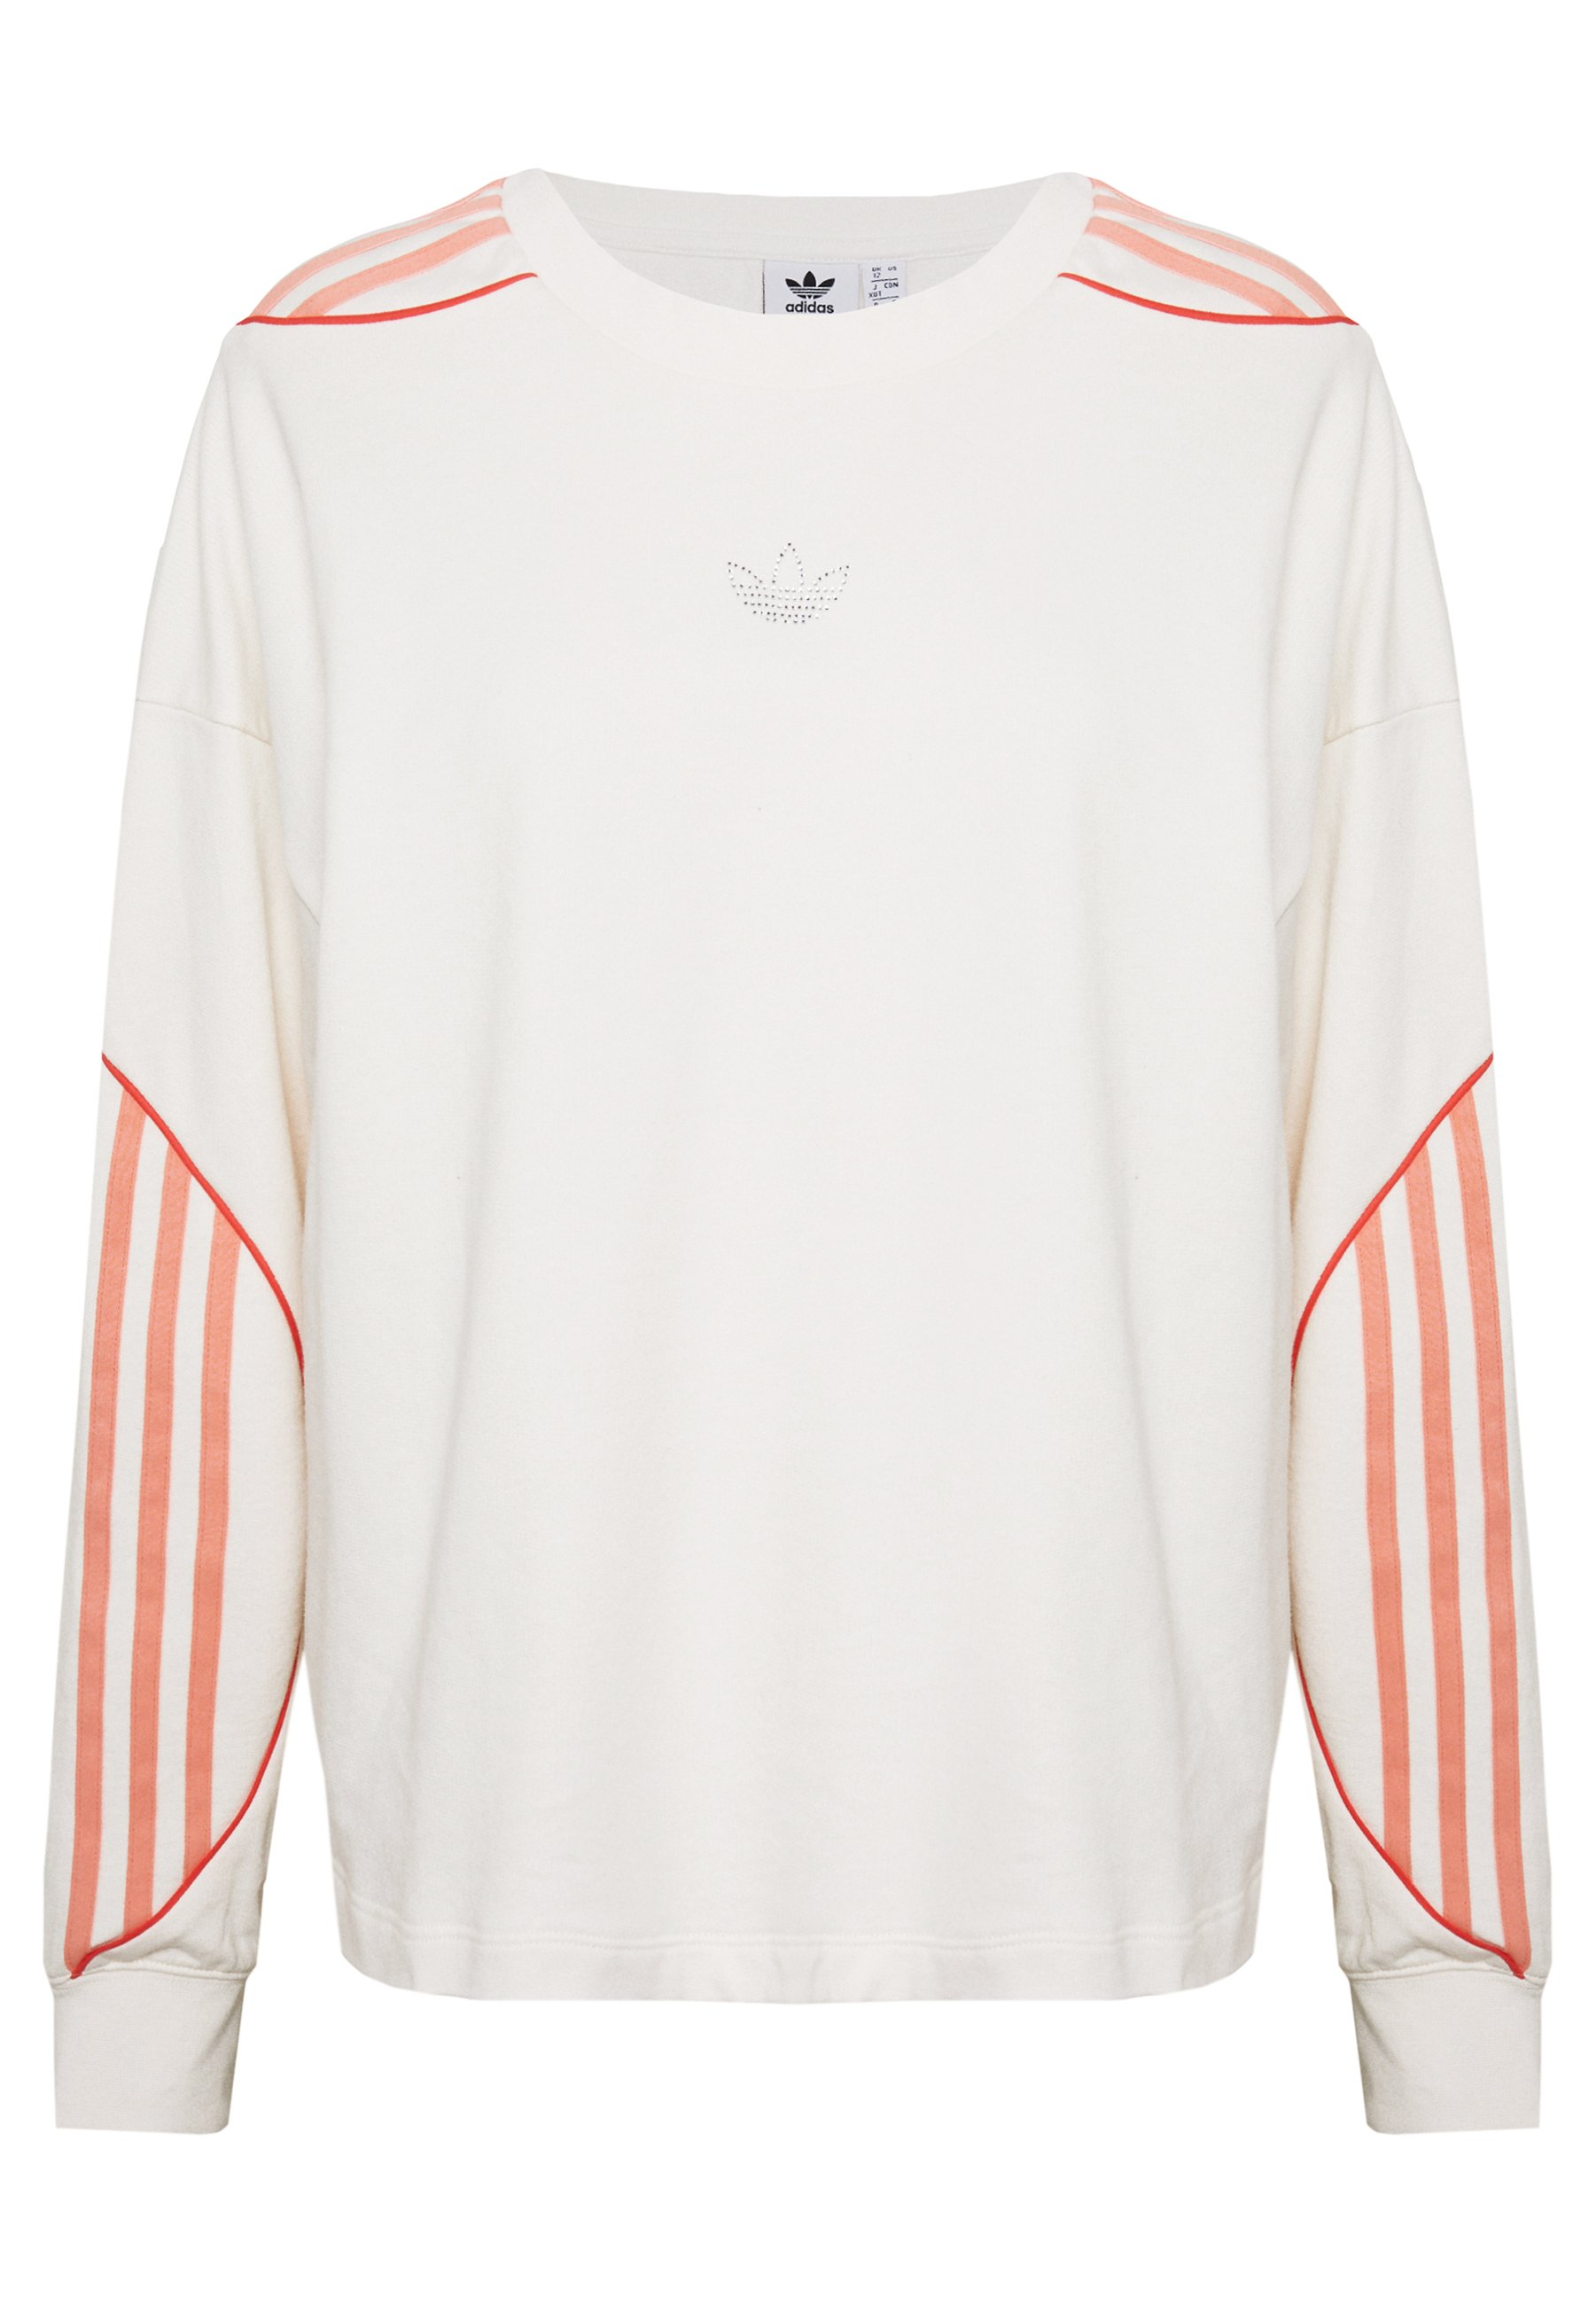 adidas Performance ADJUST Sweatshirt white Zalando.at